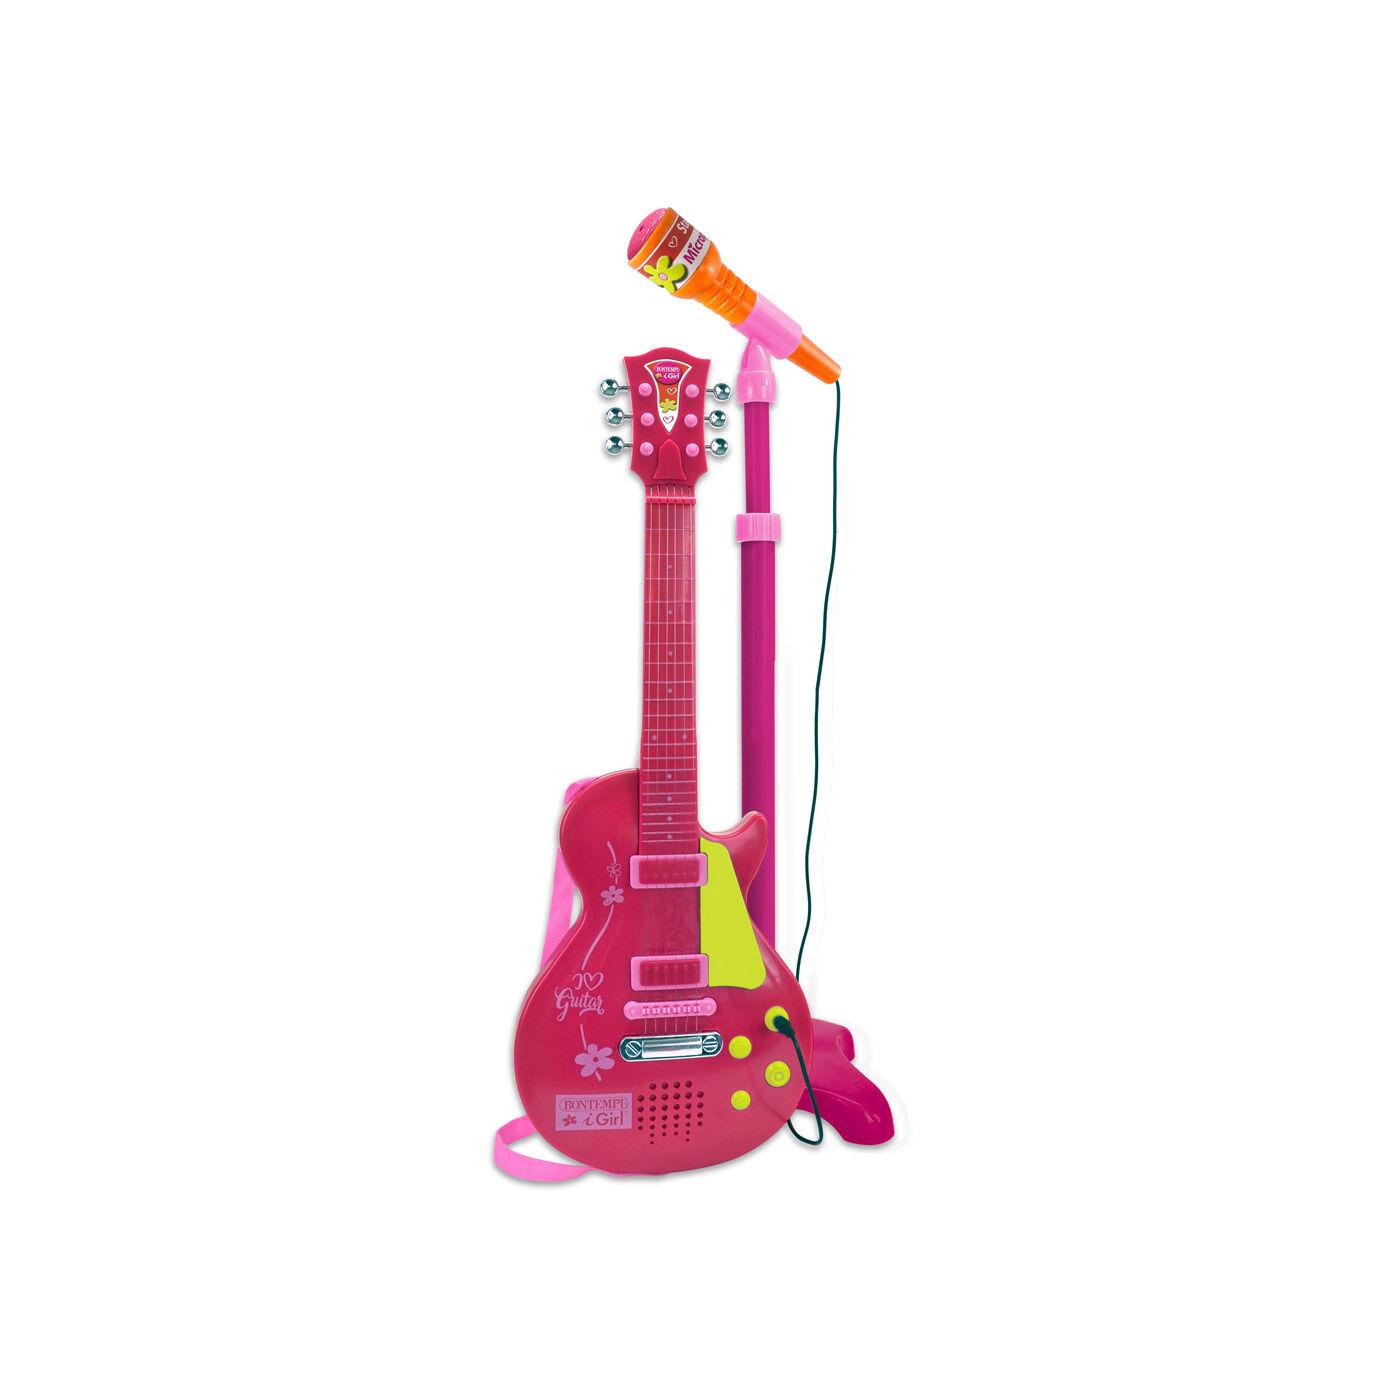 Bontempi rock gitár pink